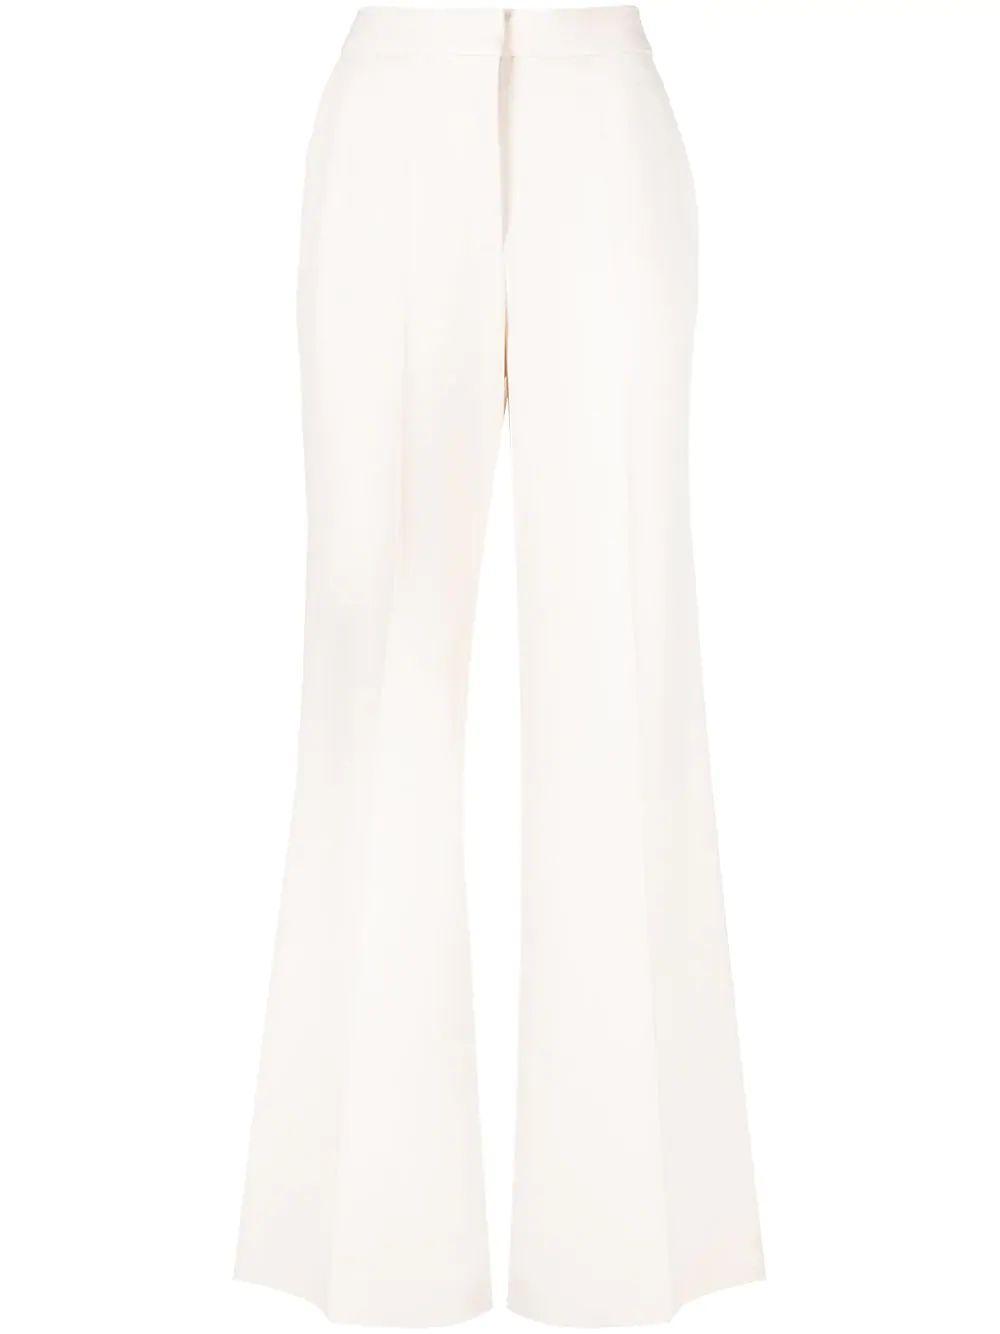 Full Length Wide Leg Pant Item # 2121WTR002274C